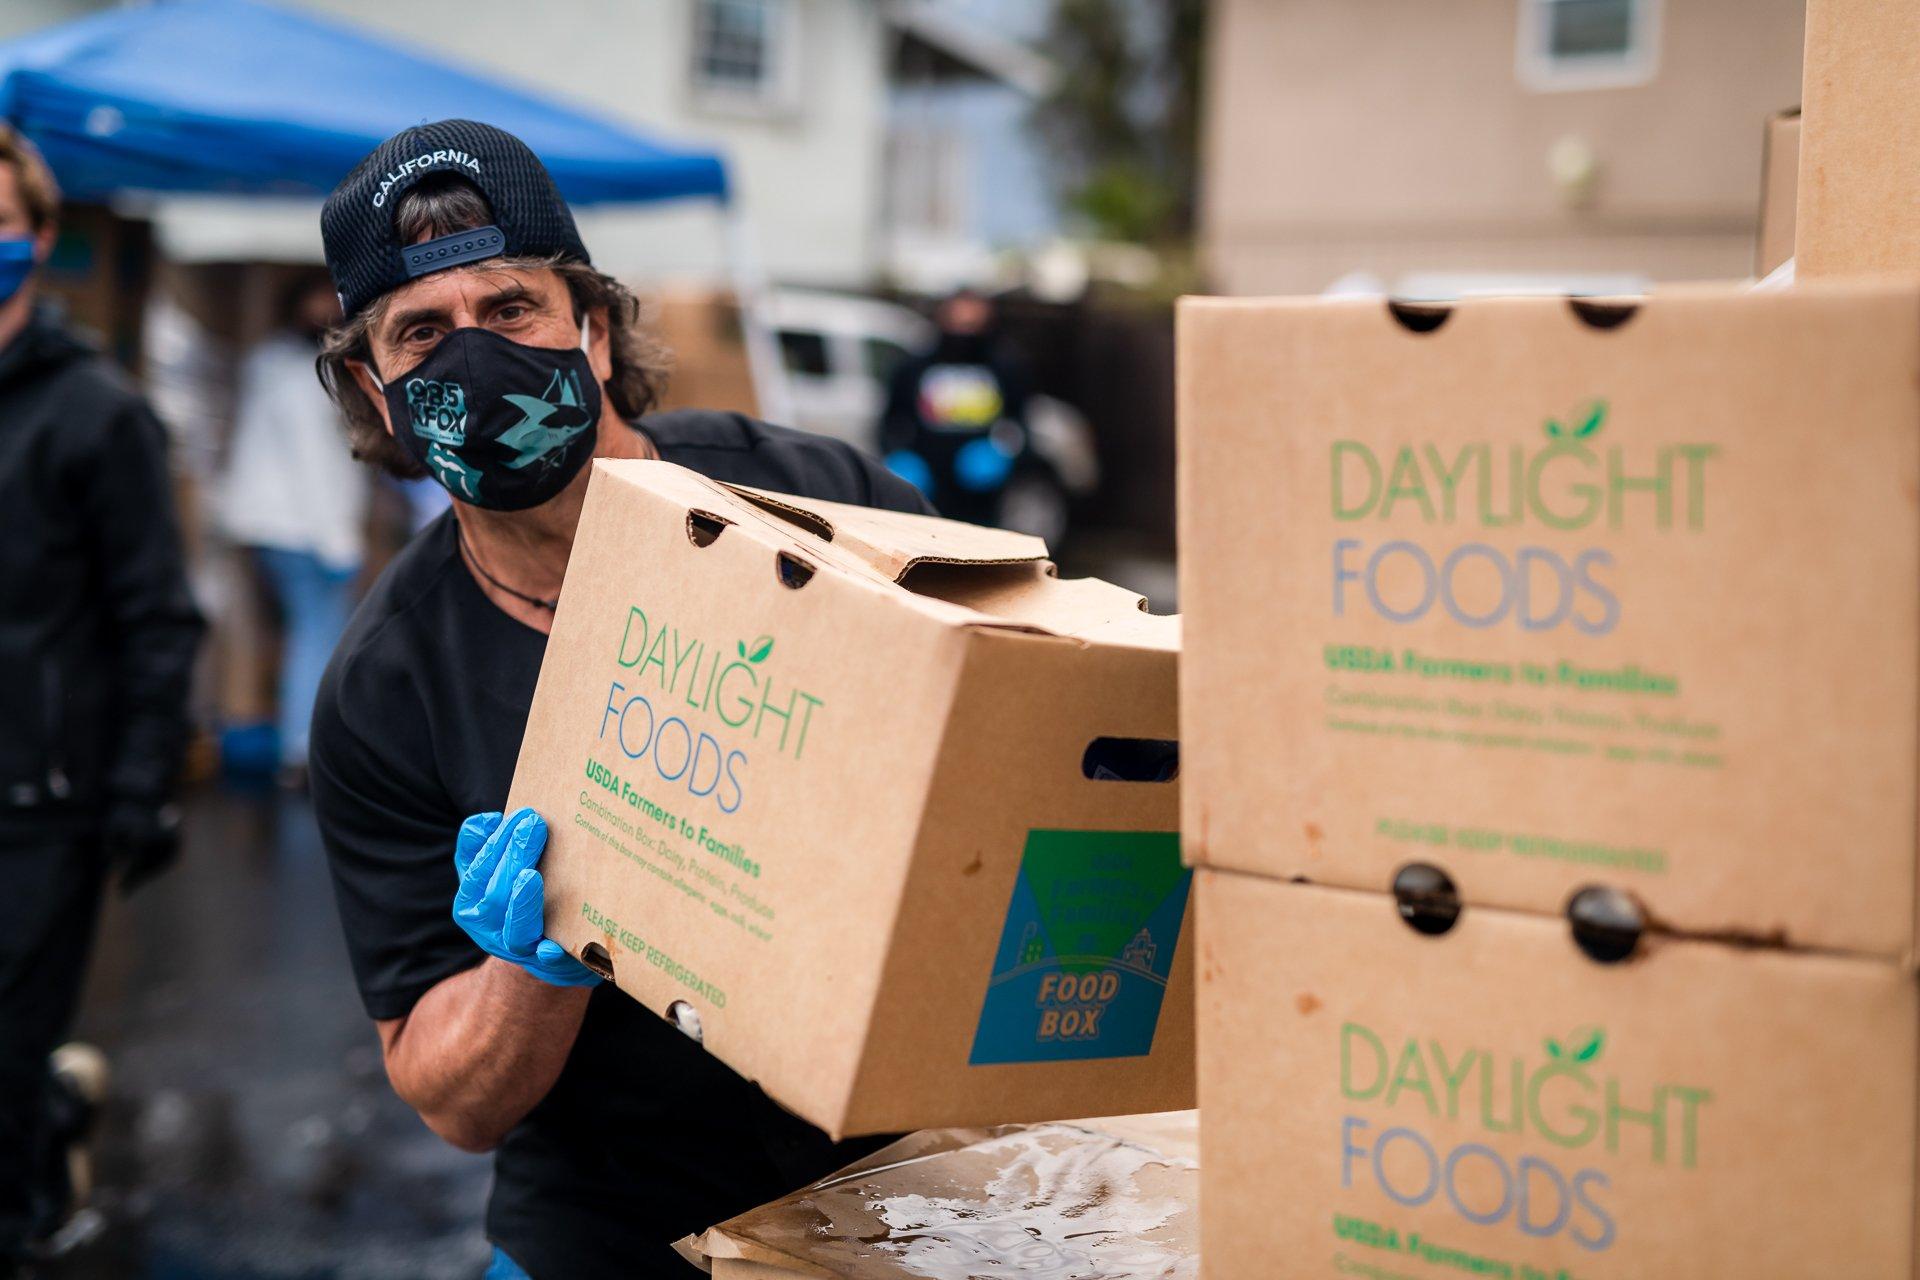 KFOX (CHRIS JACKSON) VOLUNTEER AWARENESS - FOOD DISTRIBUTION